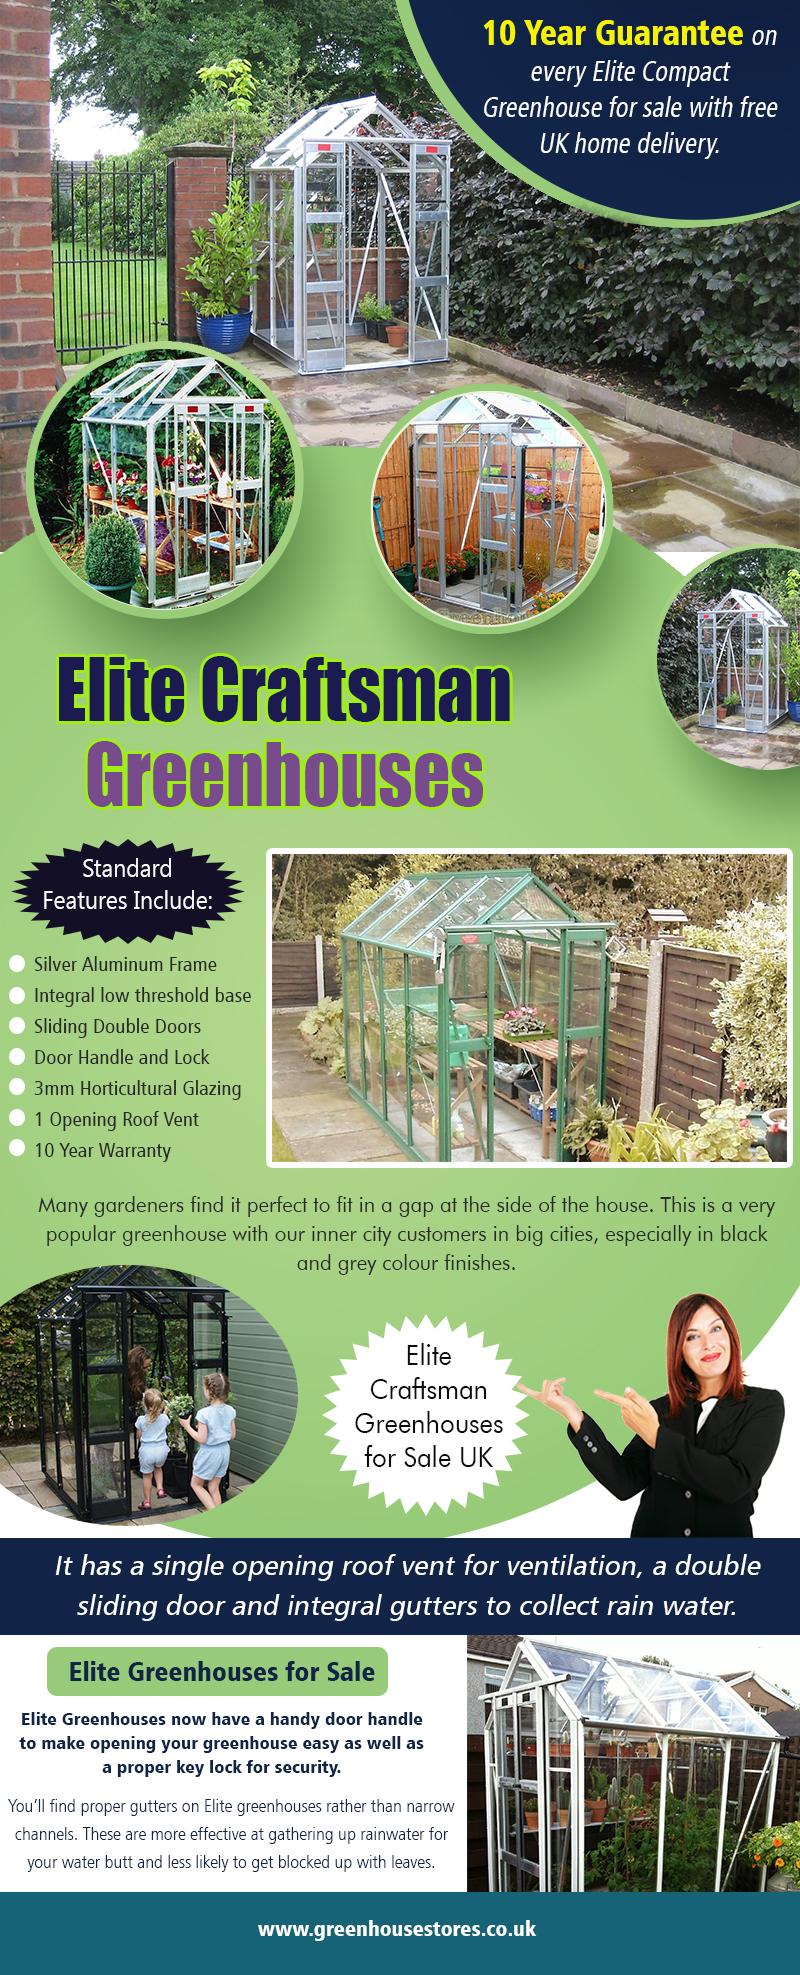 Elite Craftsman Greenhouses